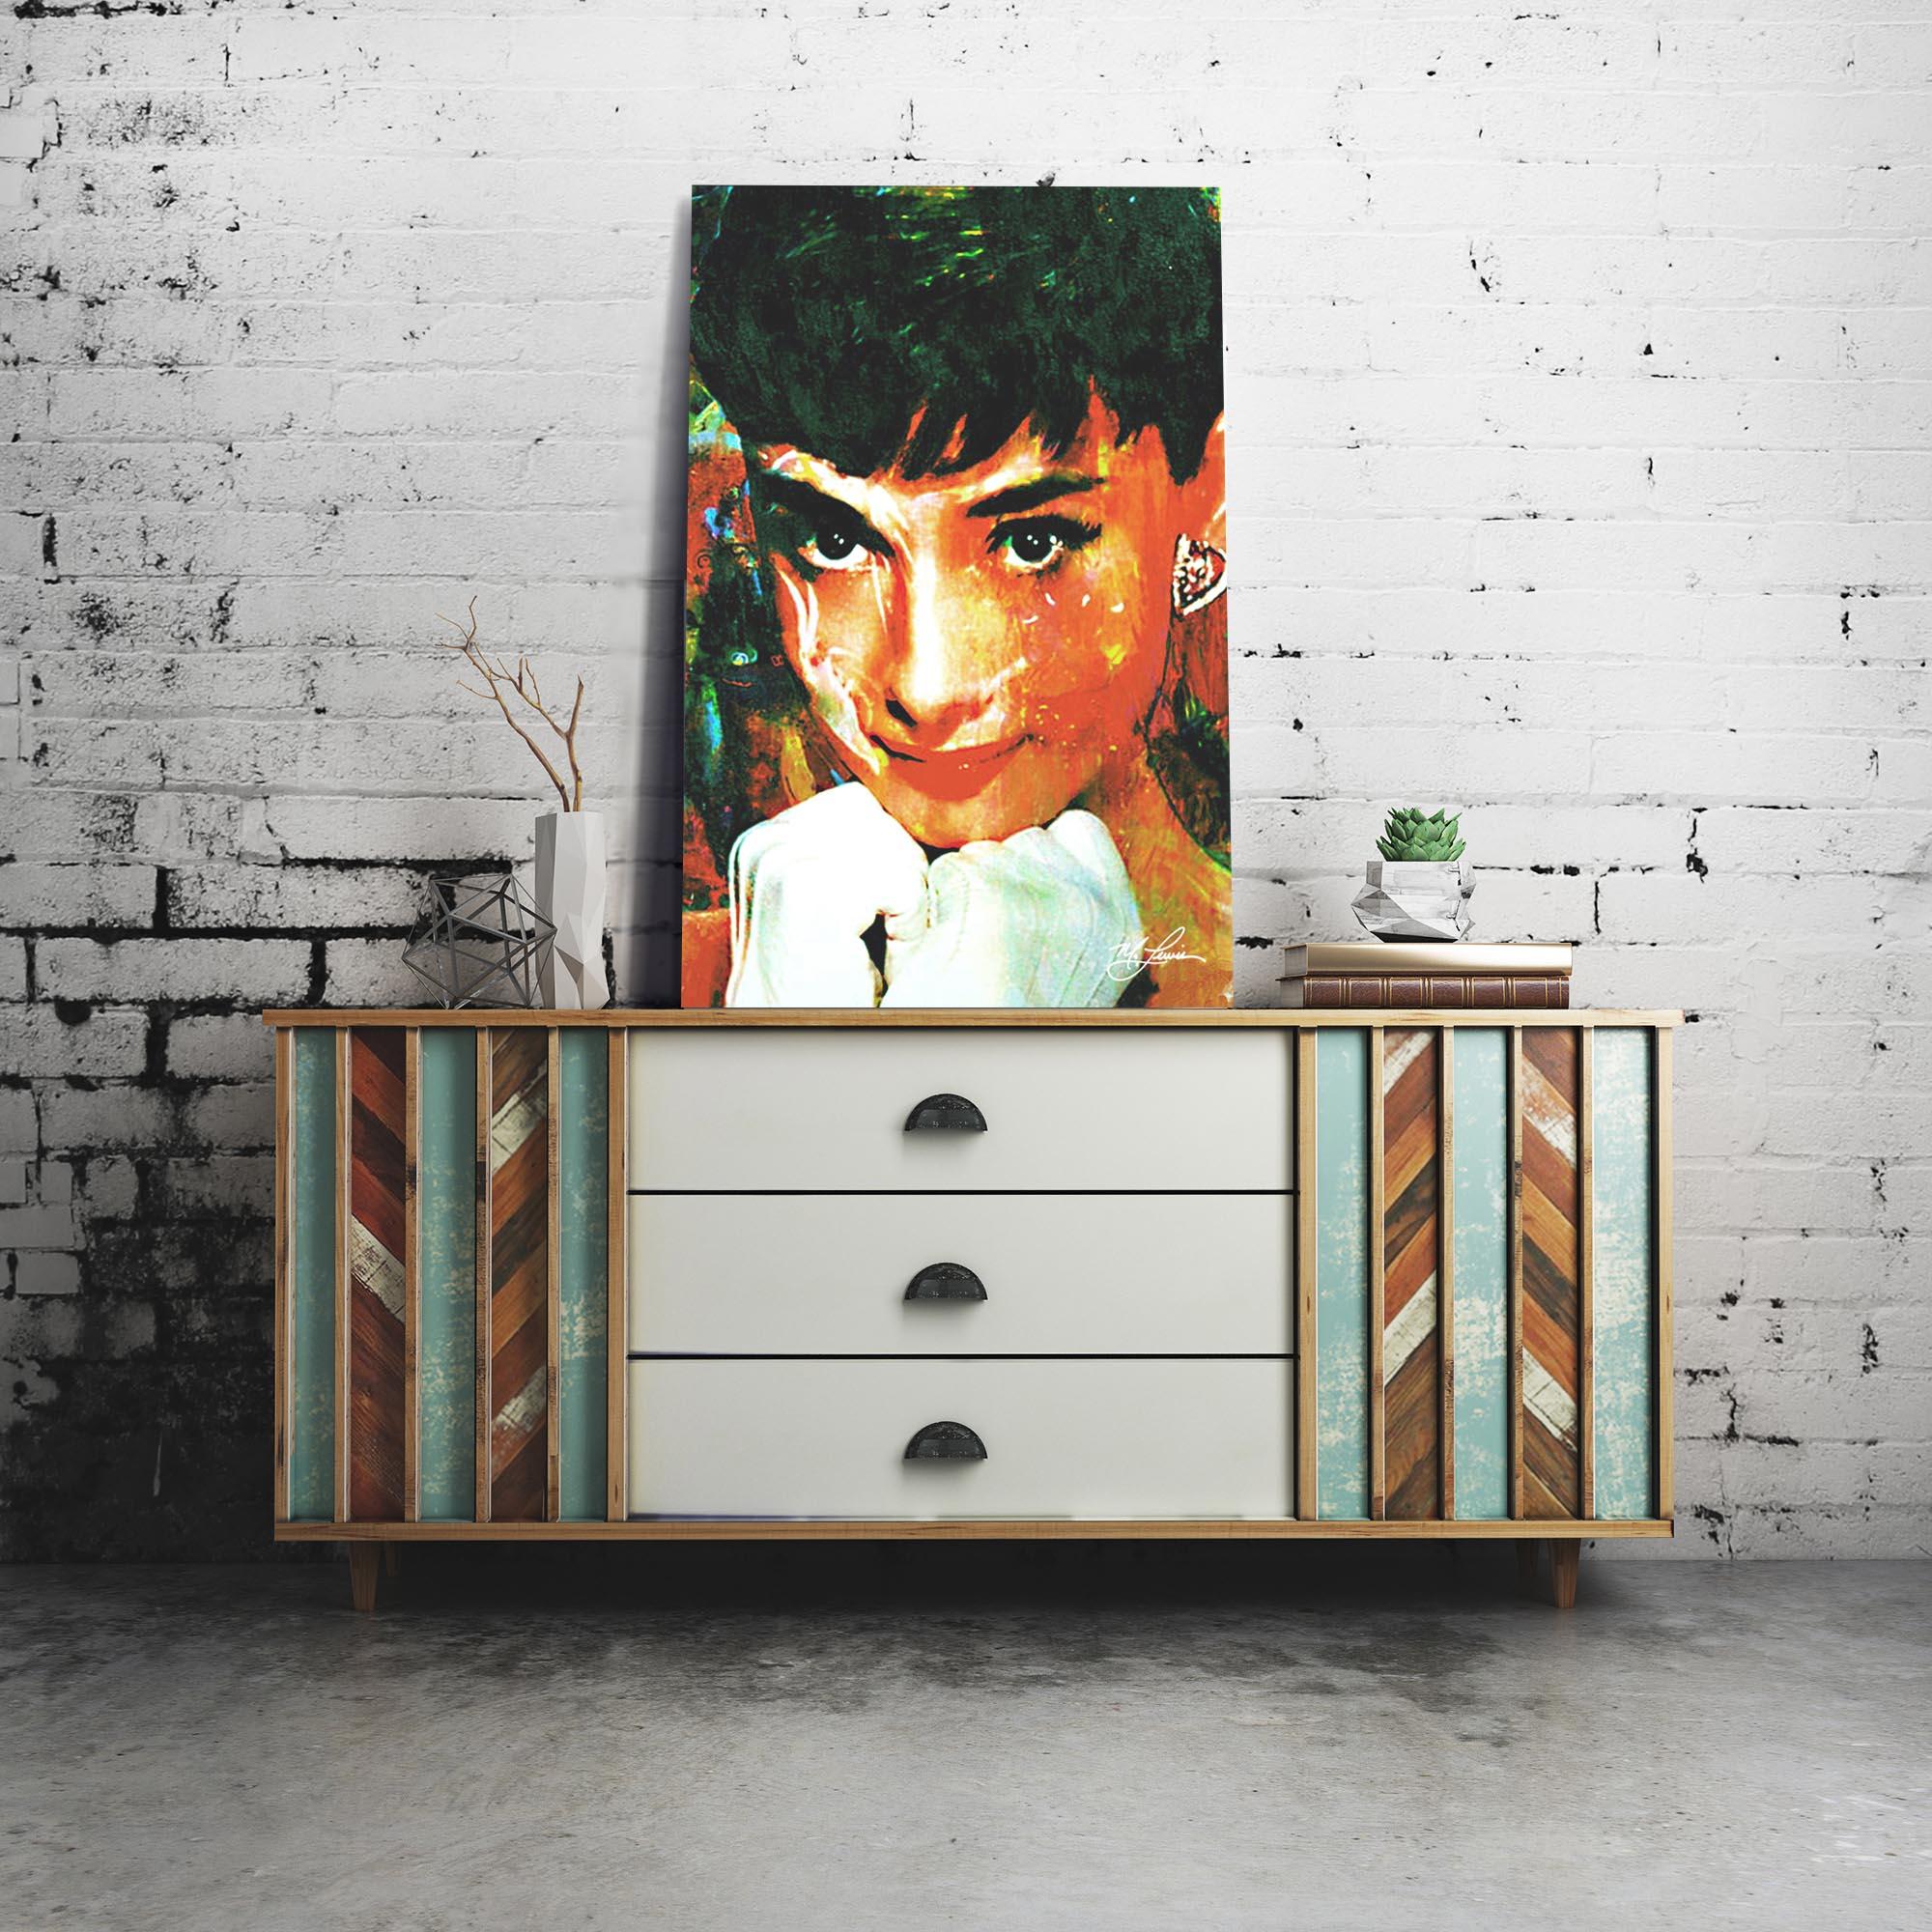 Audrey Hepburn Tiffany Delight 22x32 Metal or Plexiglass Pop Art Portrait - Lifestyle View